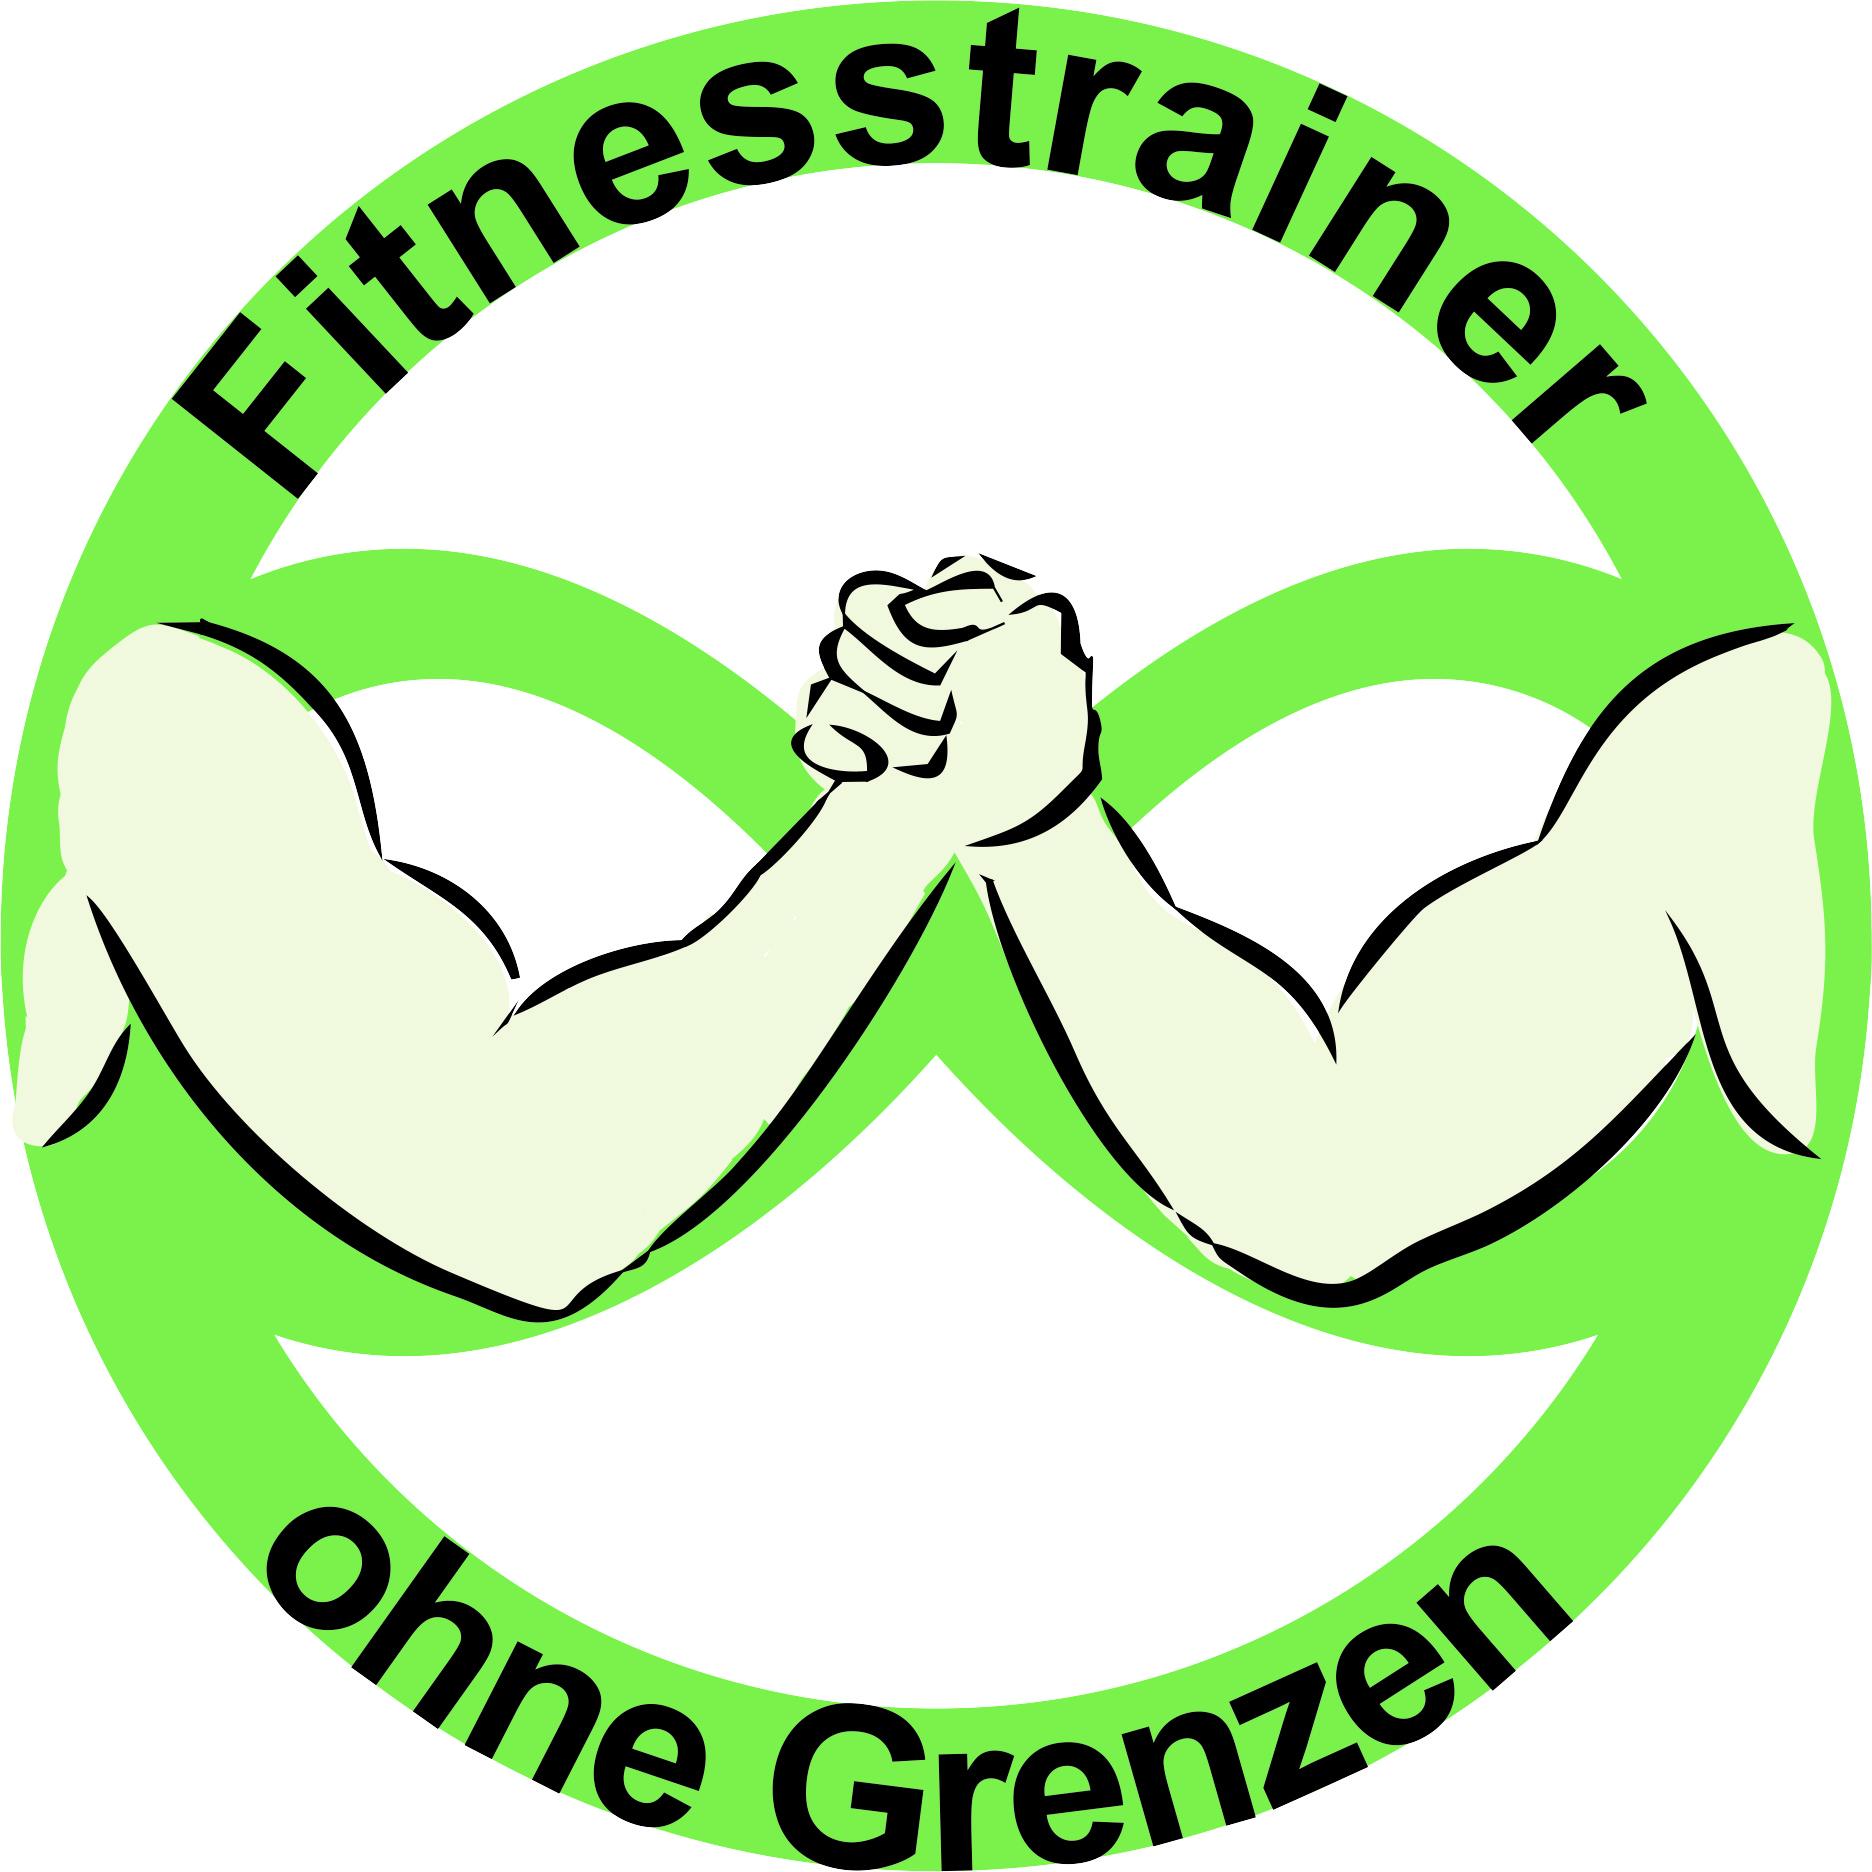 Fitnesstrainer ohne Grenzen